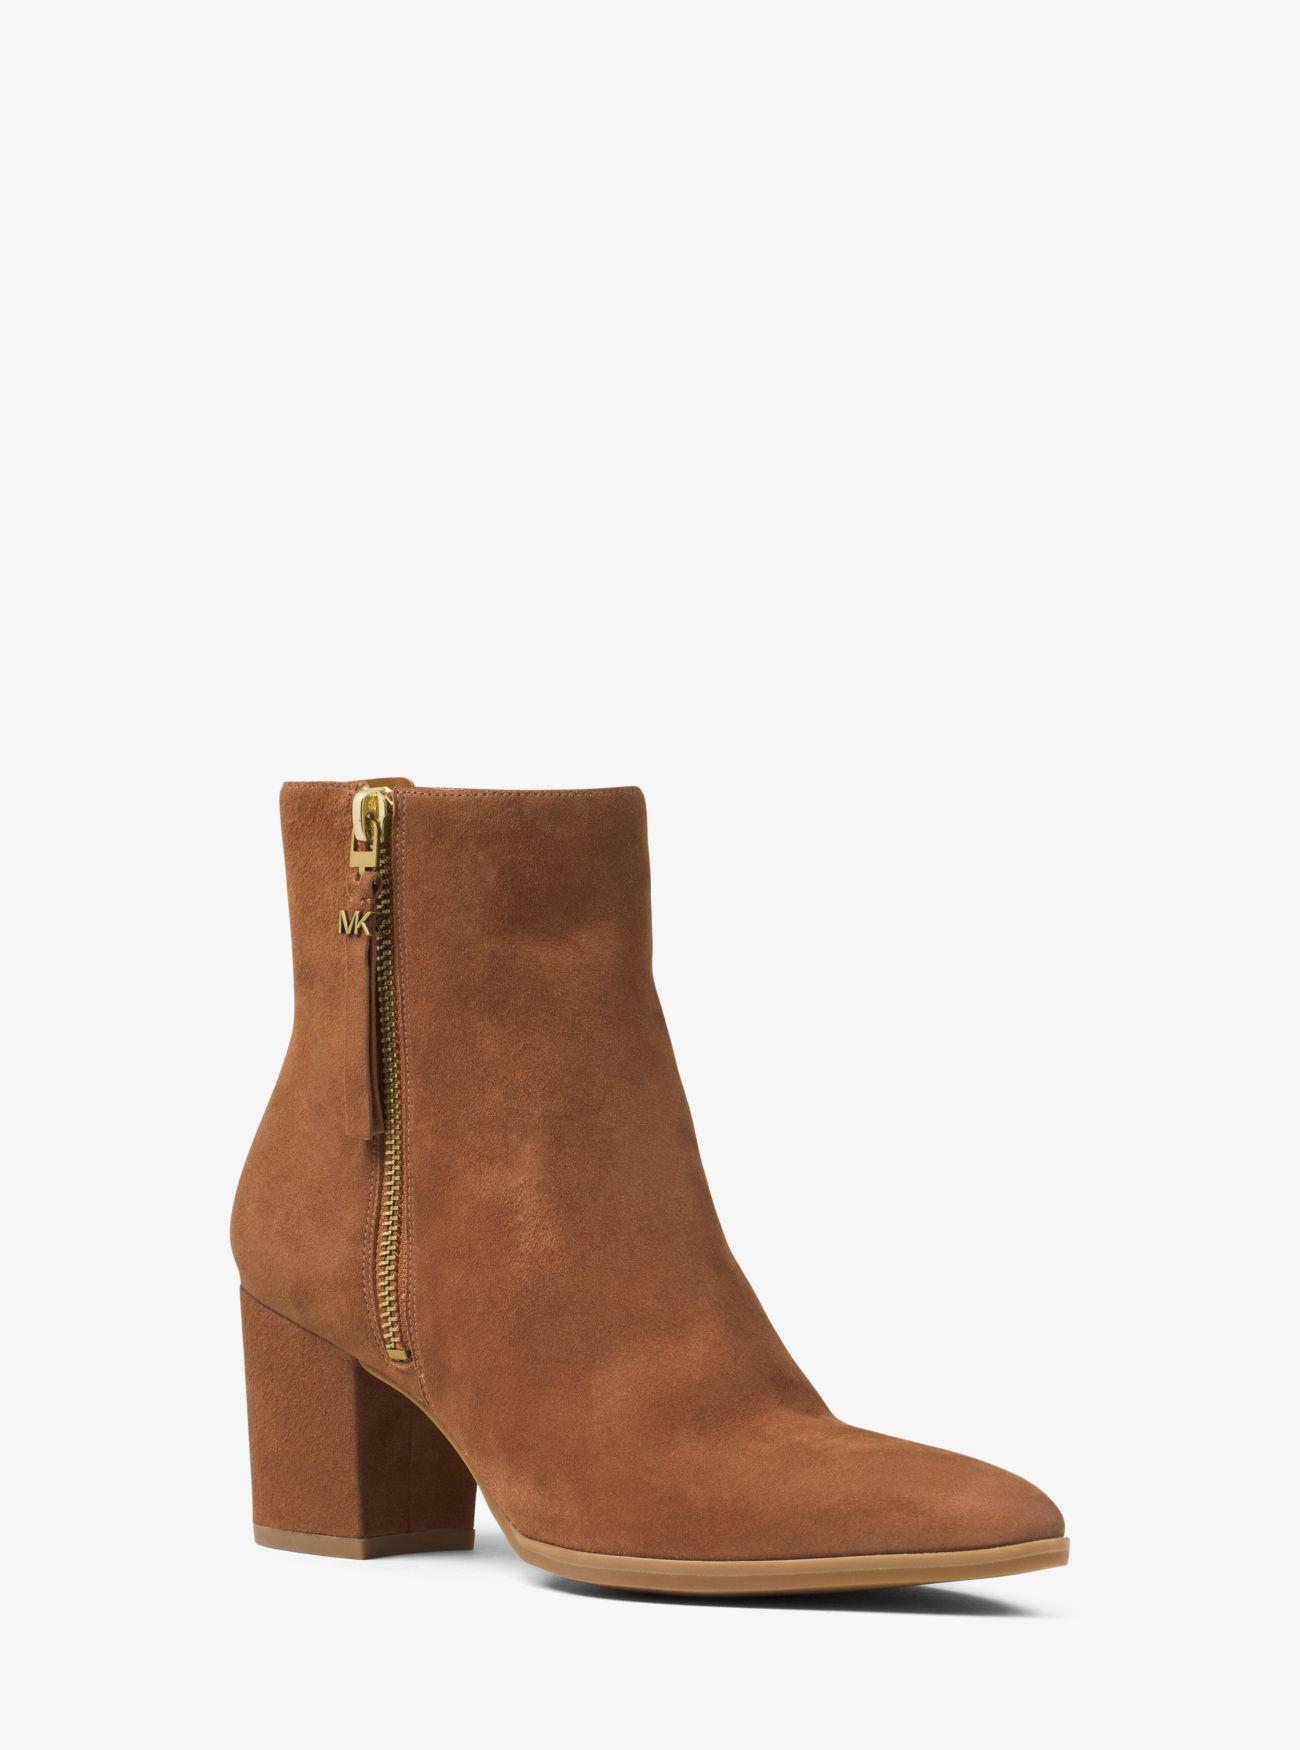 Michael Kors Brown Suede Shoes